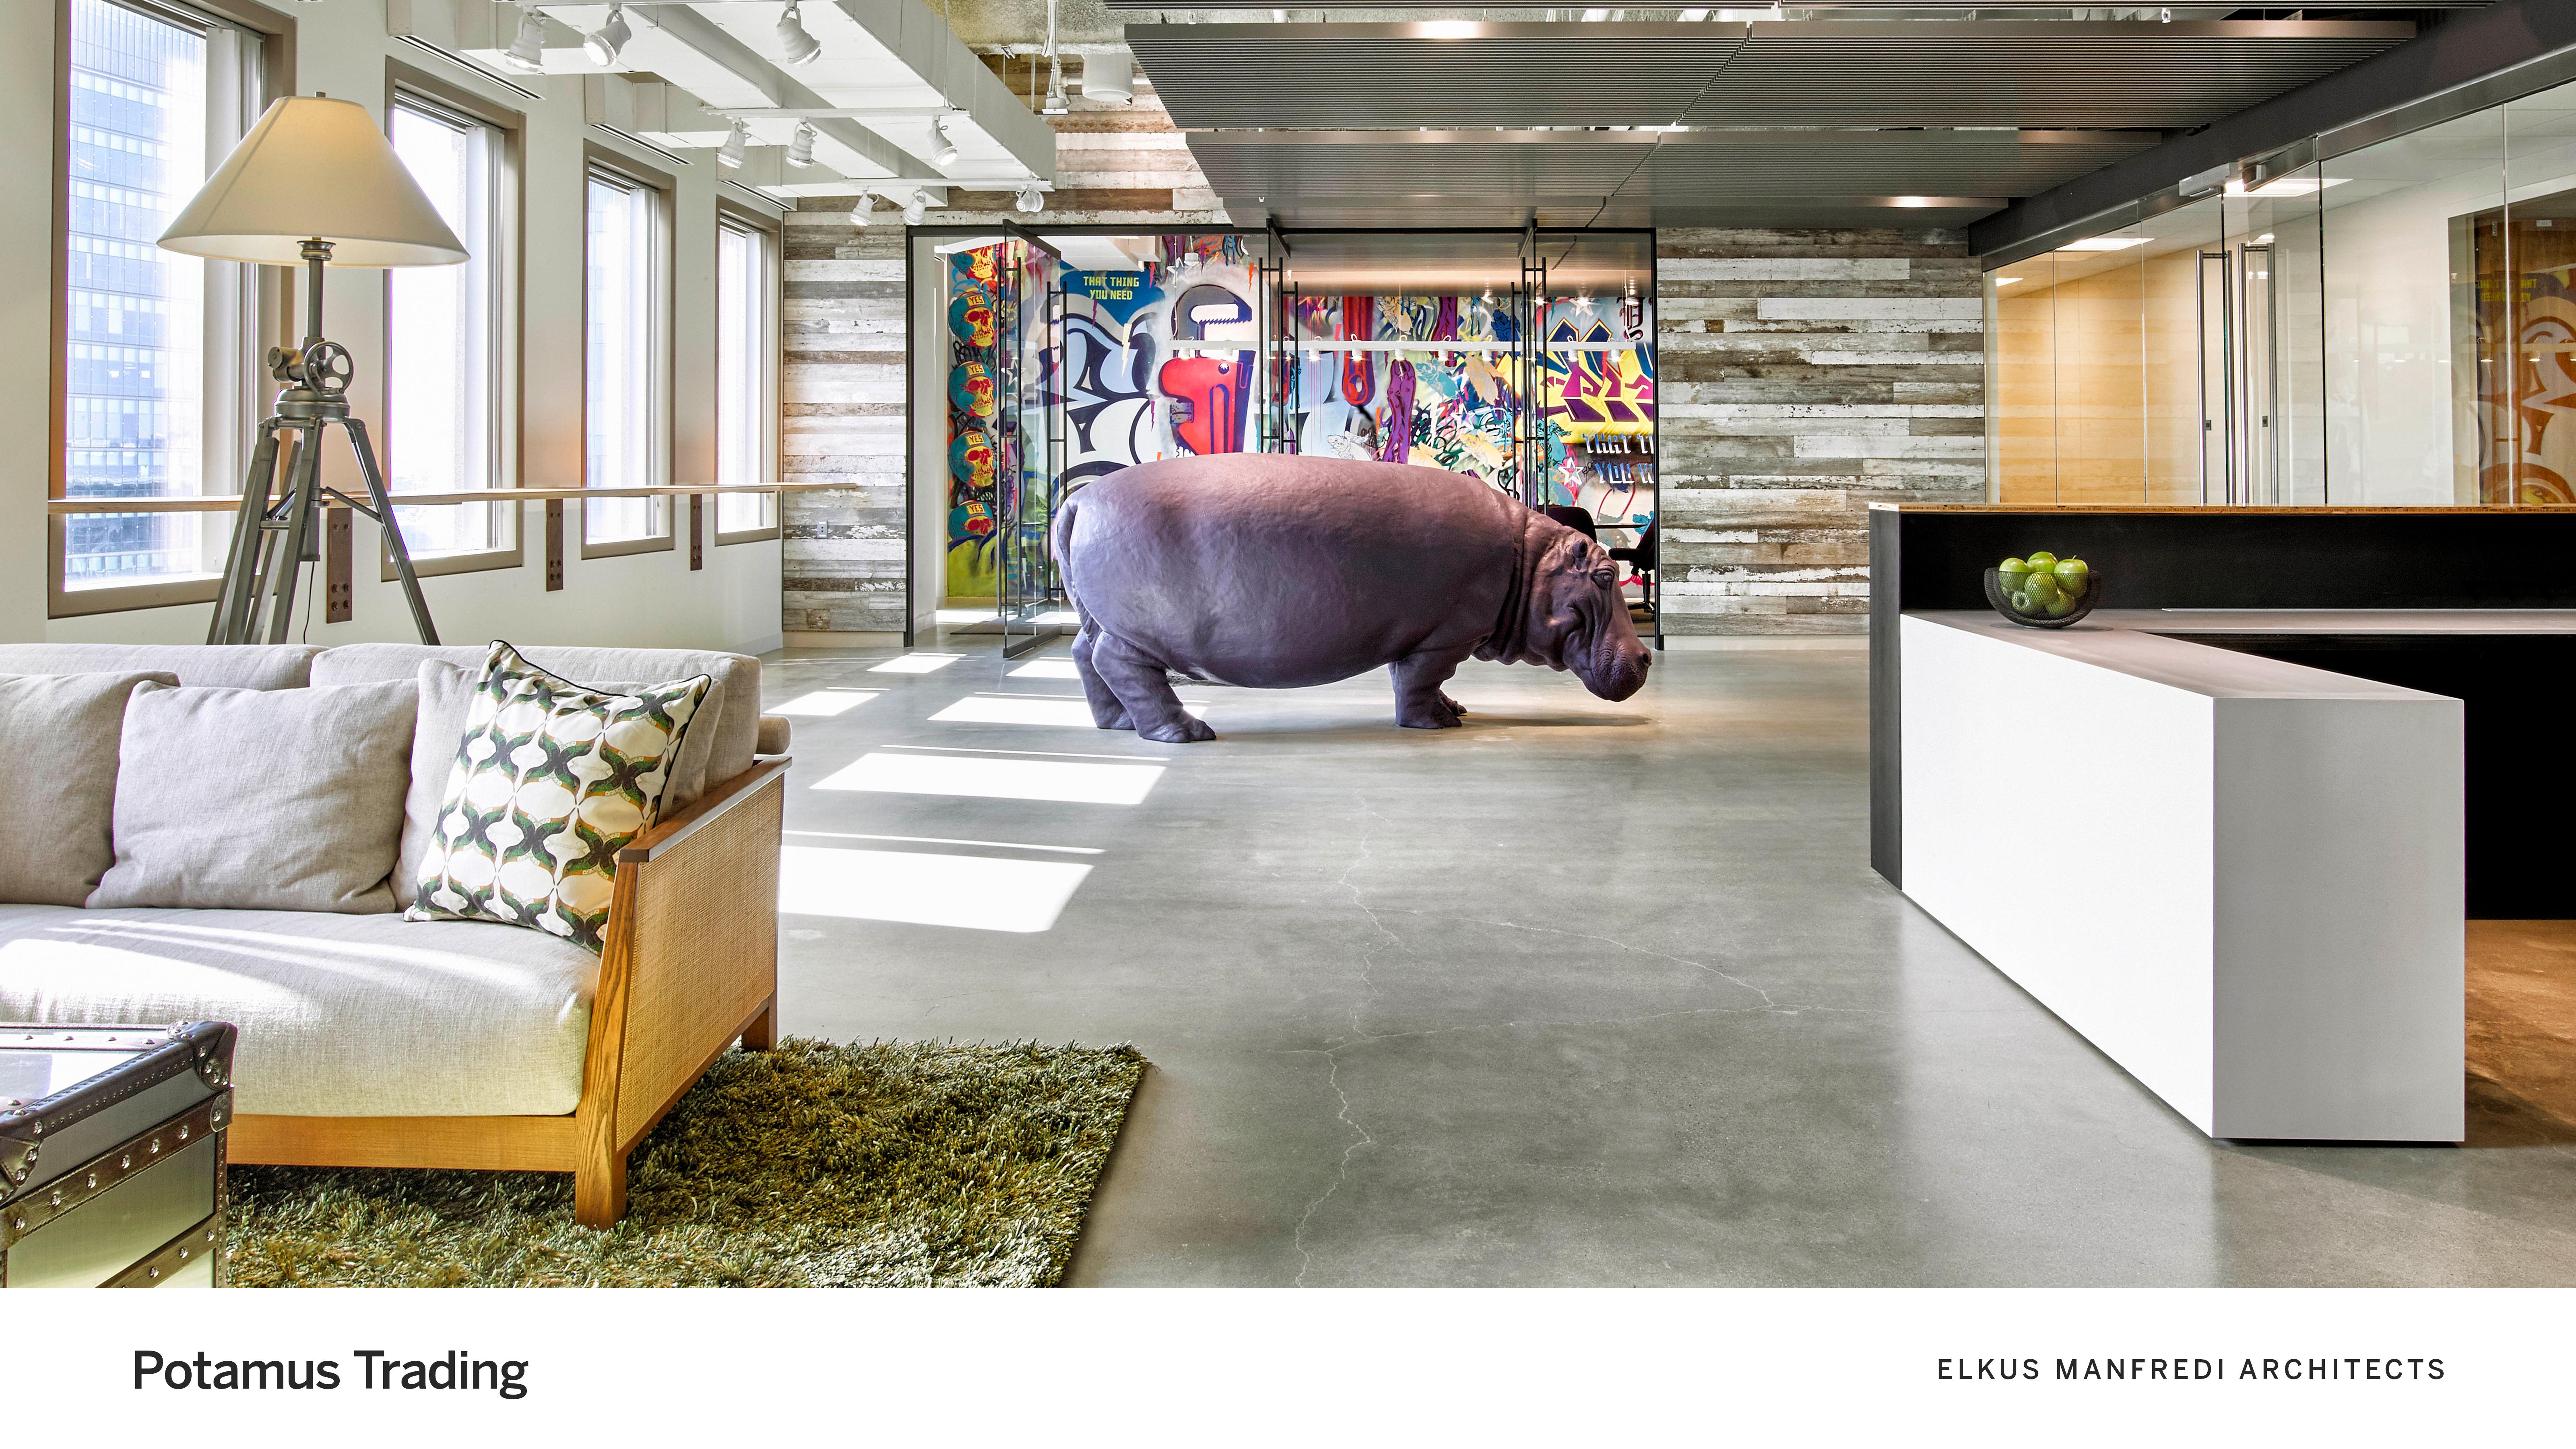 Potamus Trading - Elkus Manfredi Architects